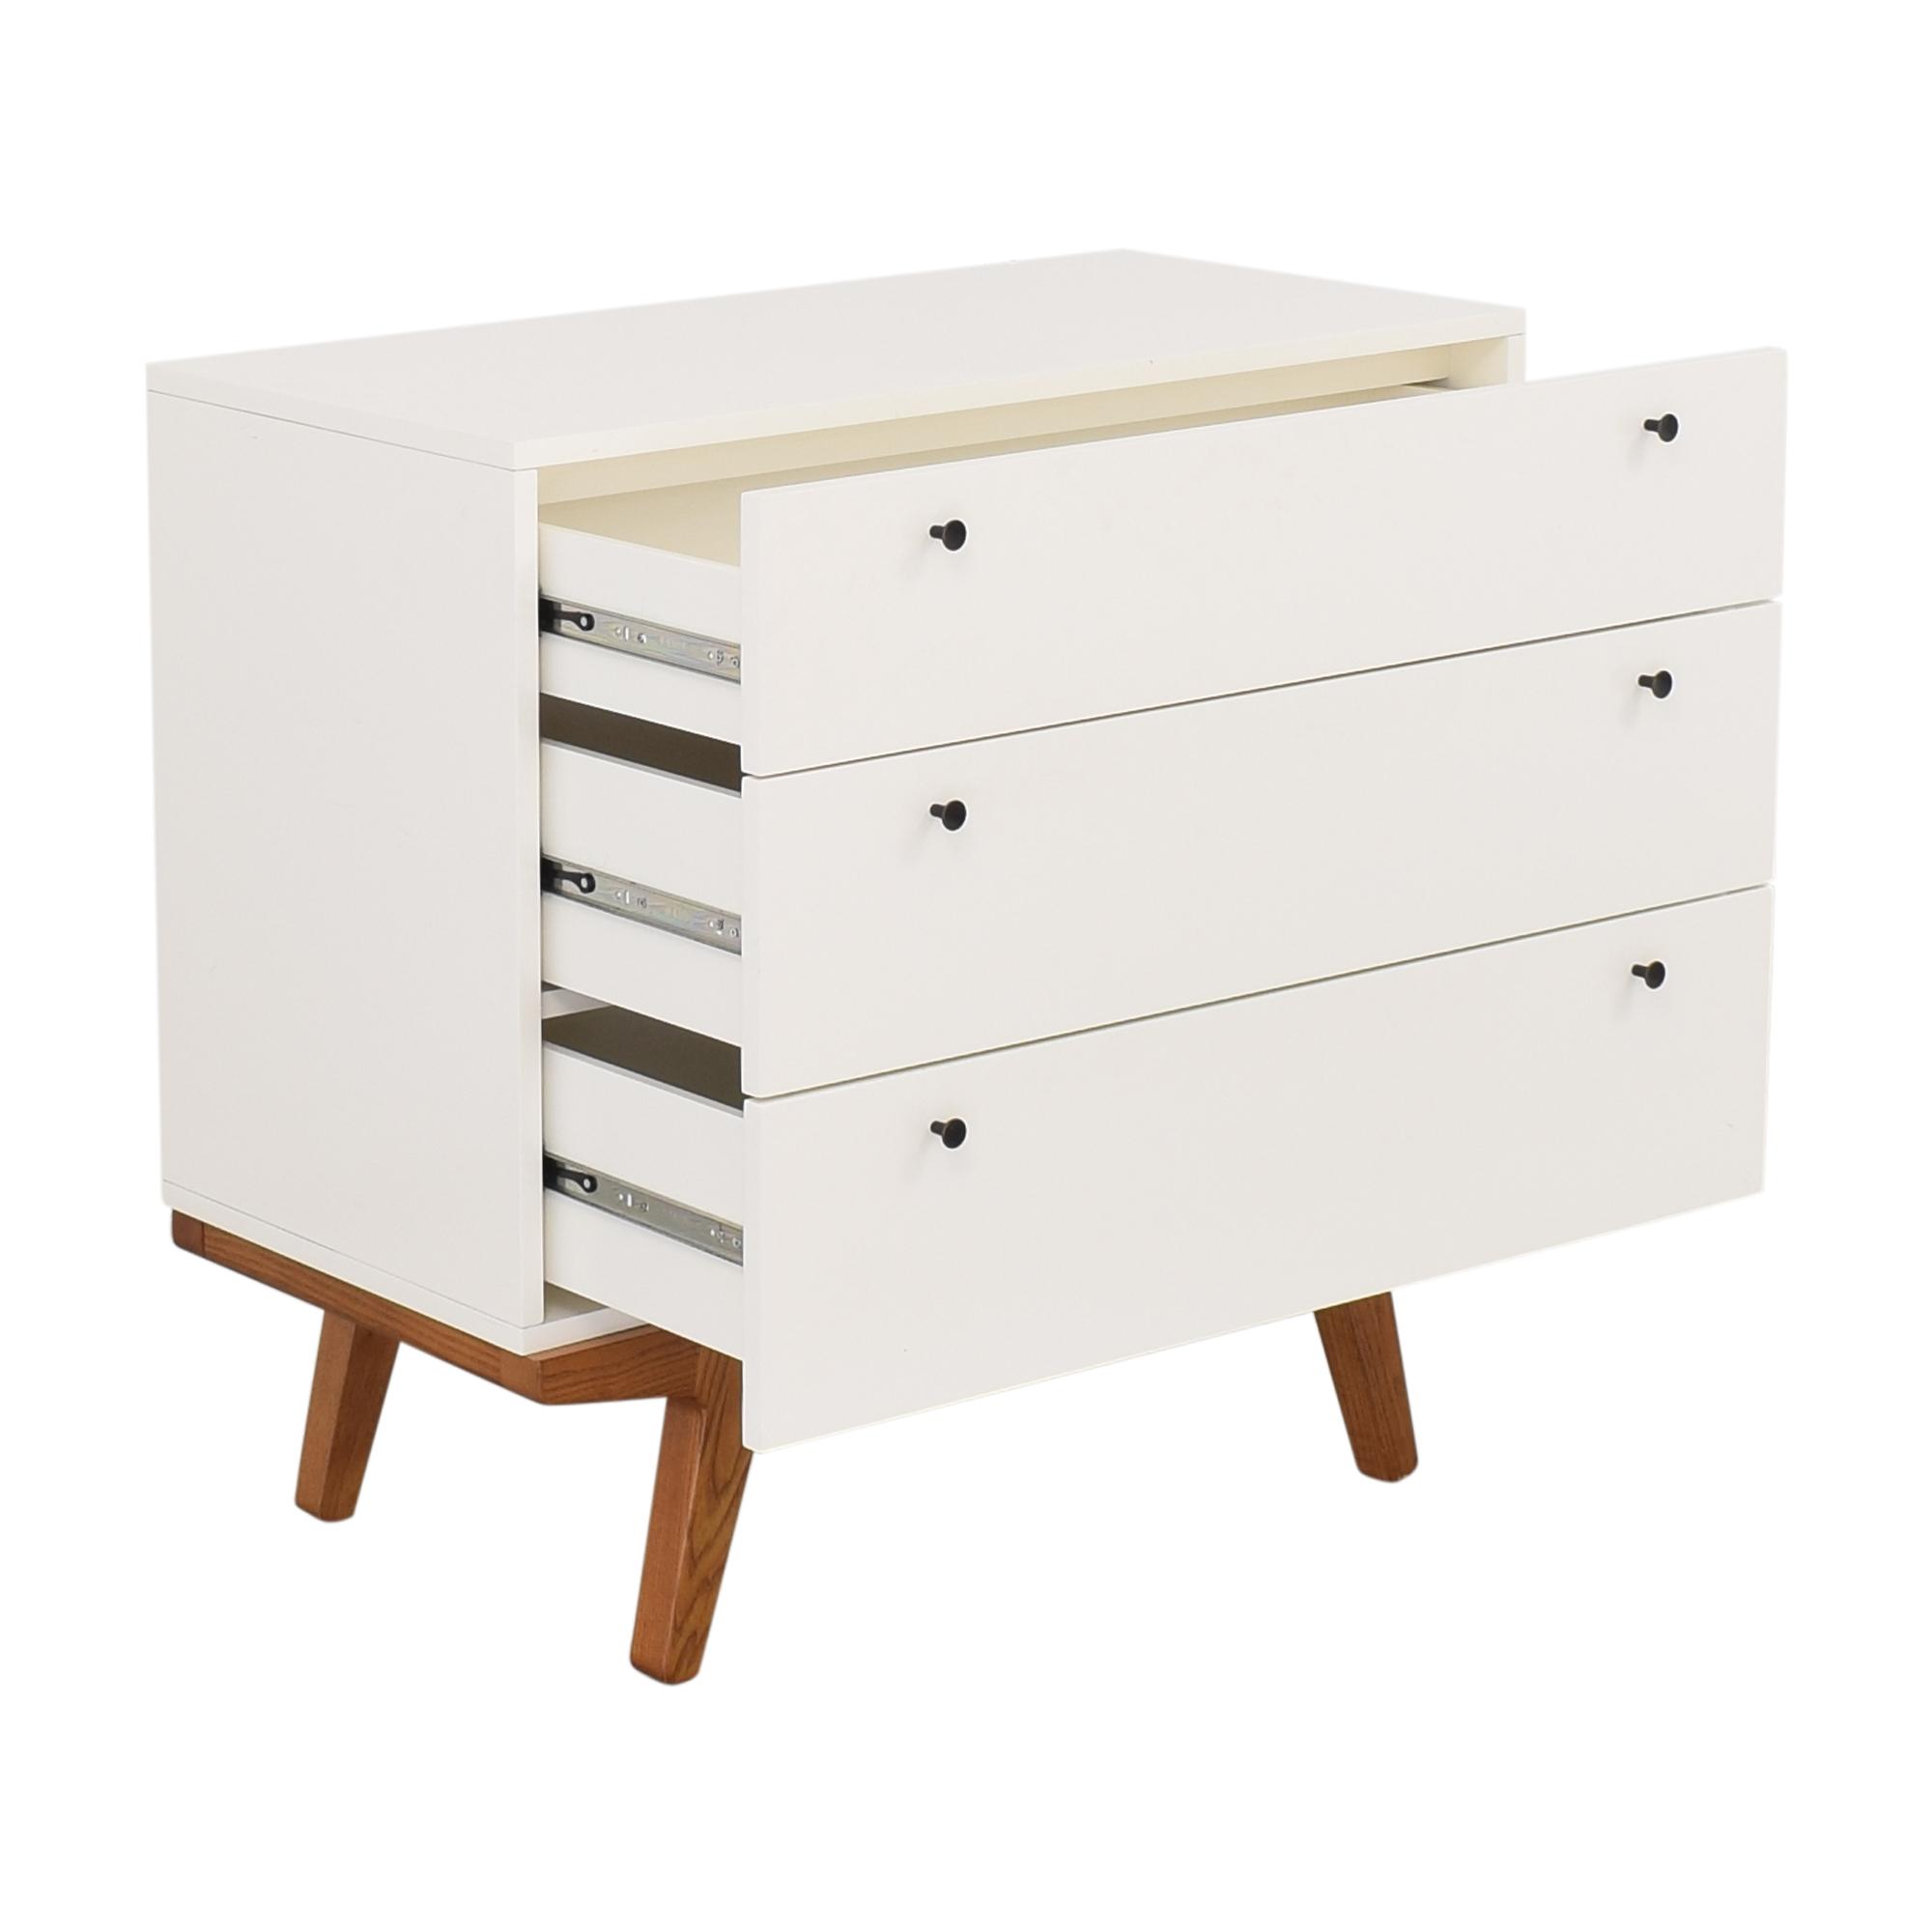 21 Off West Elm West Elm Modern 3 Drawer Dresser Storage